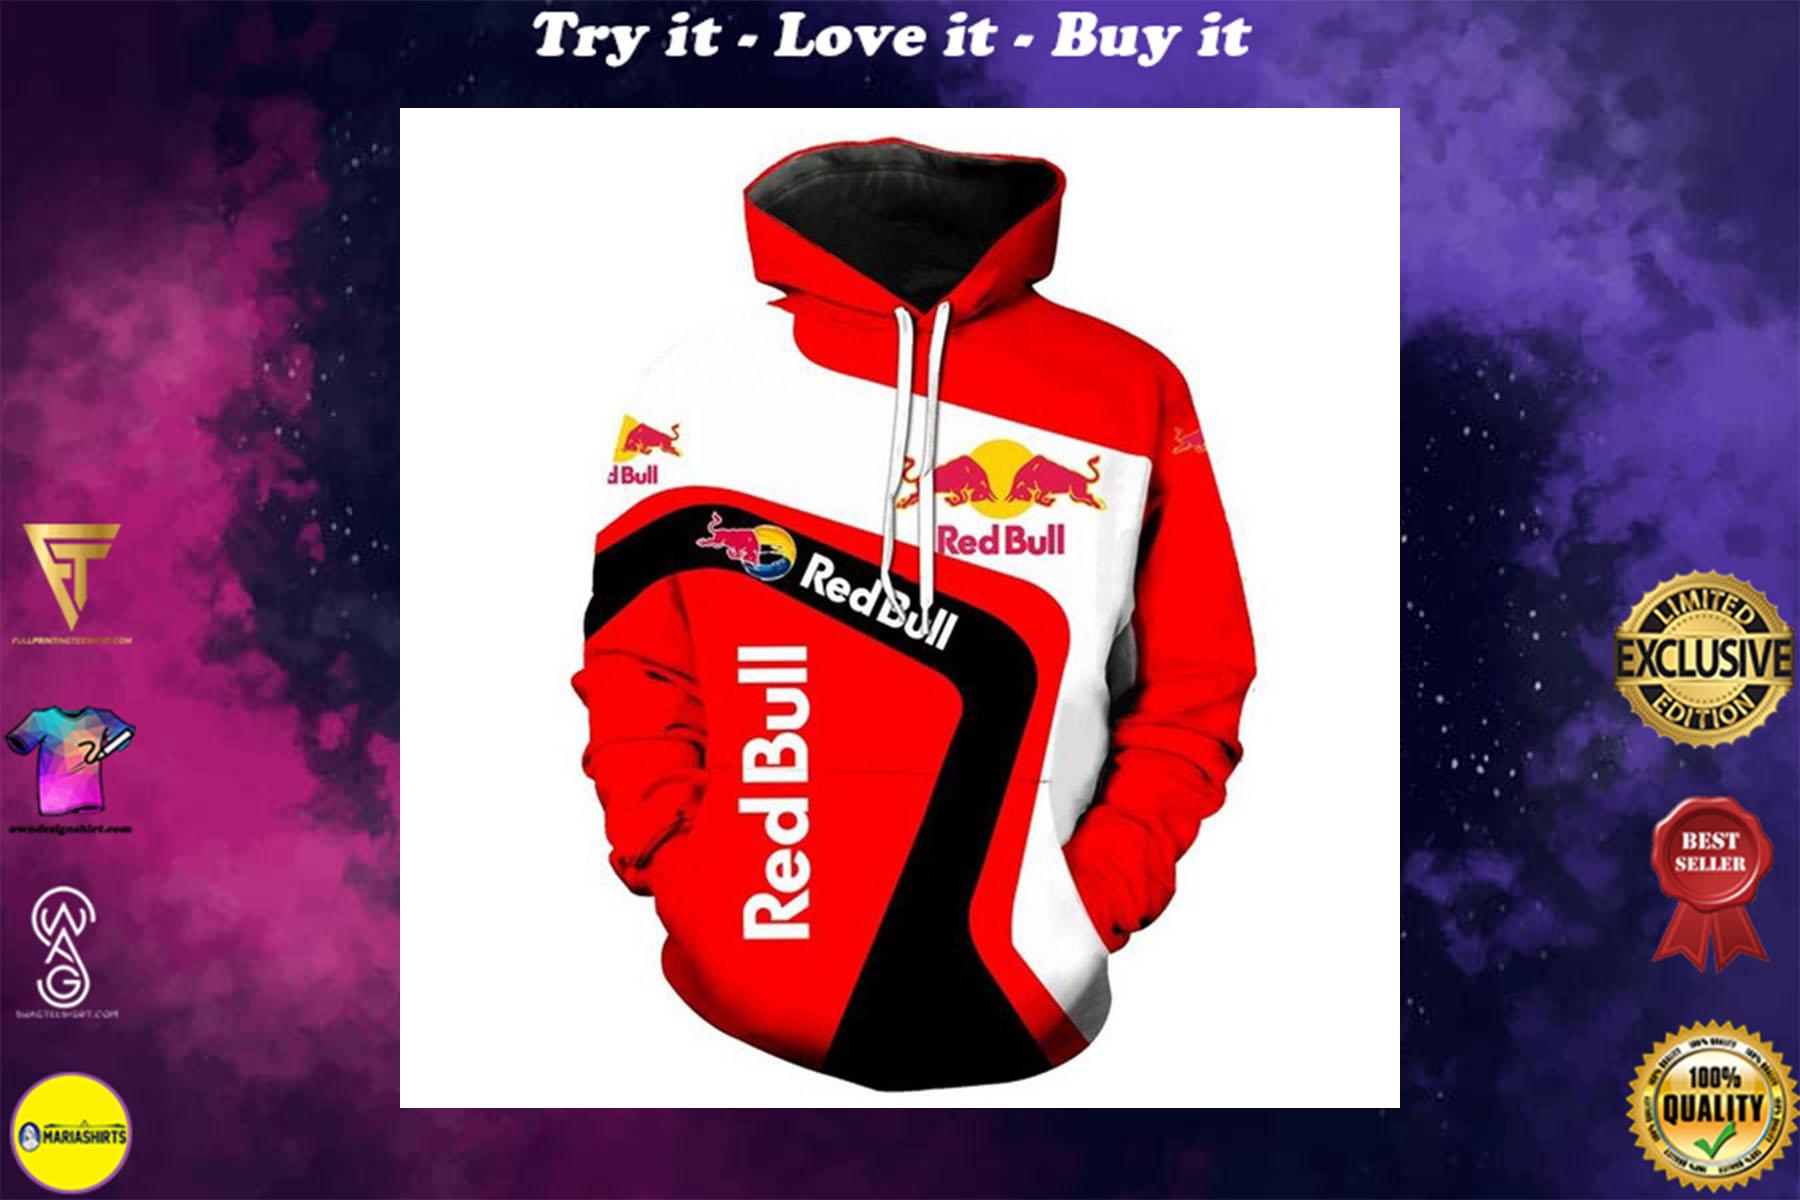 [special edition] ktm redbull team motorcycle sport riding racing full printing shirt - maria